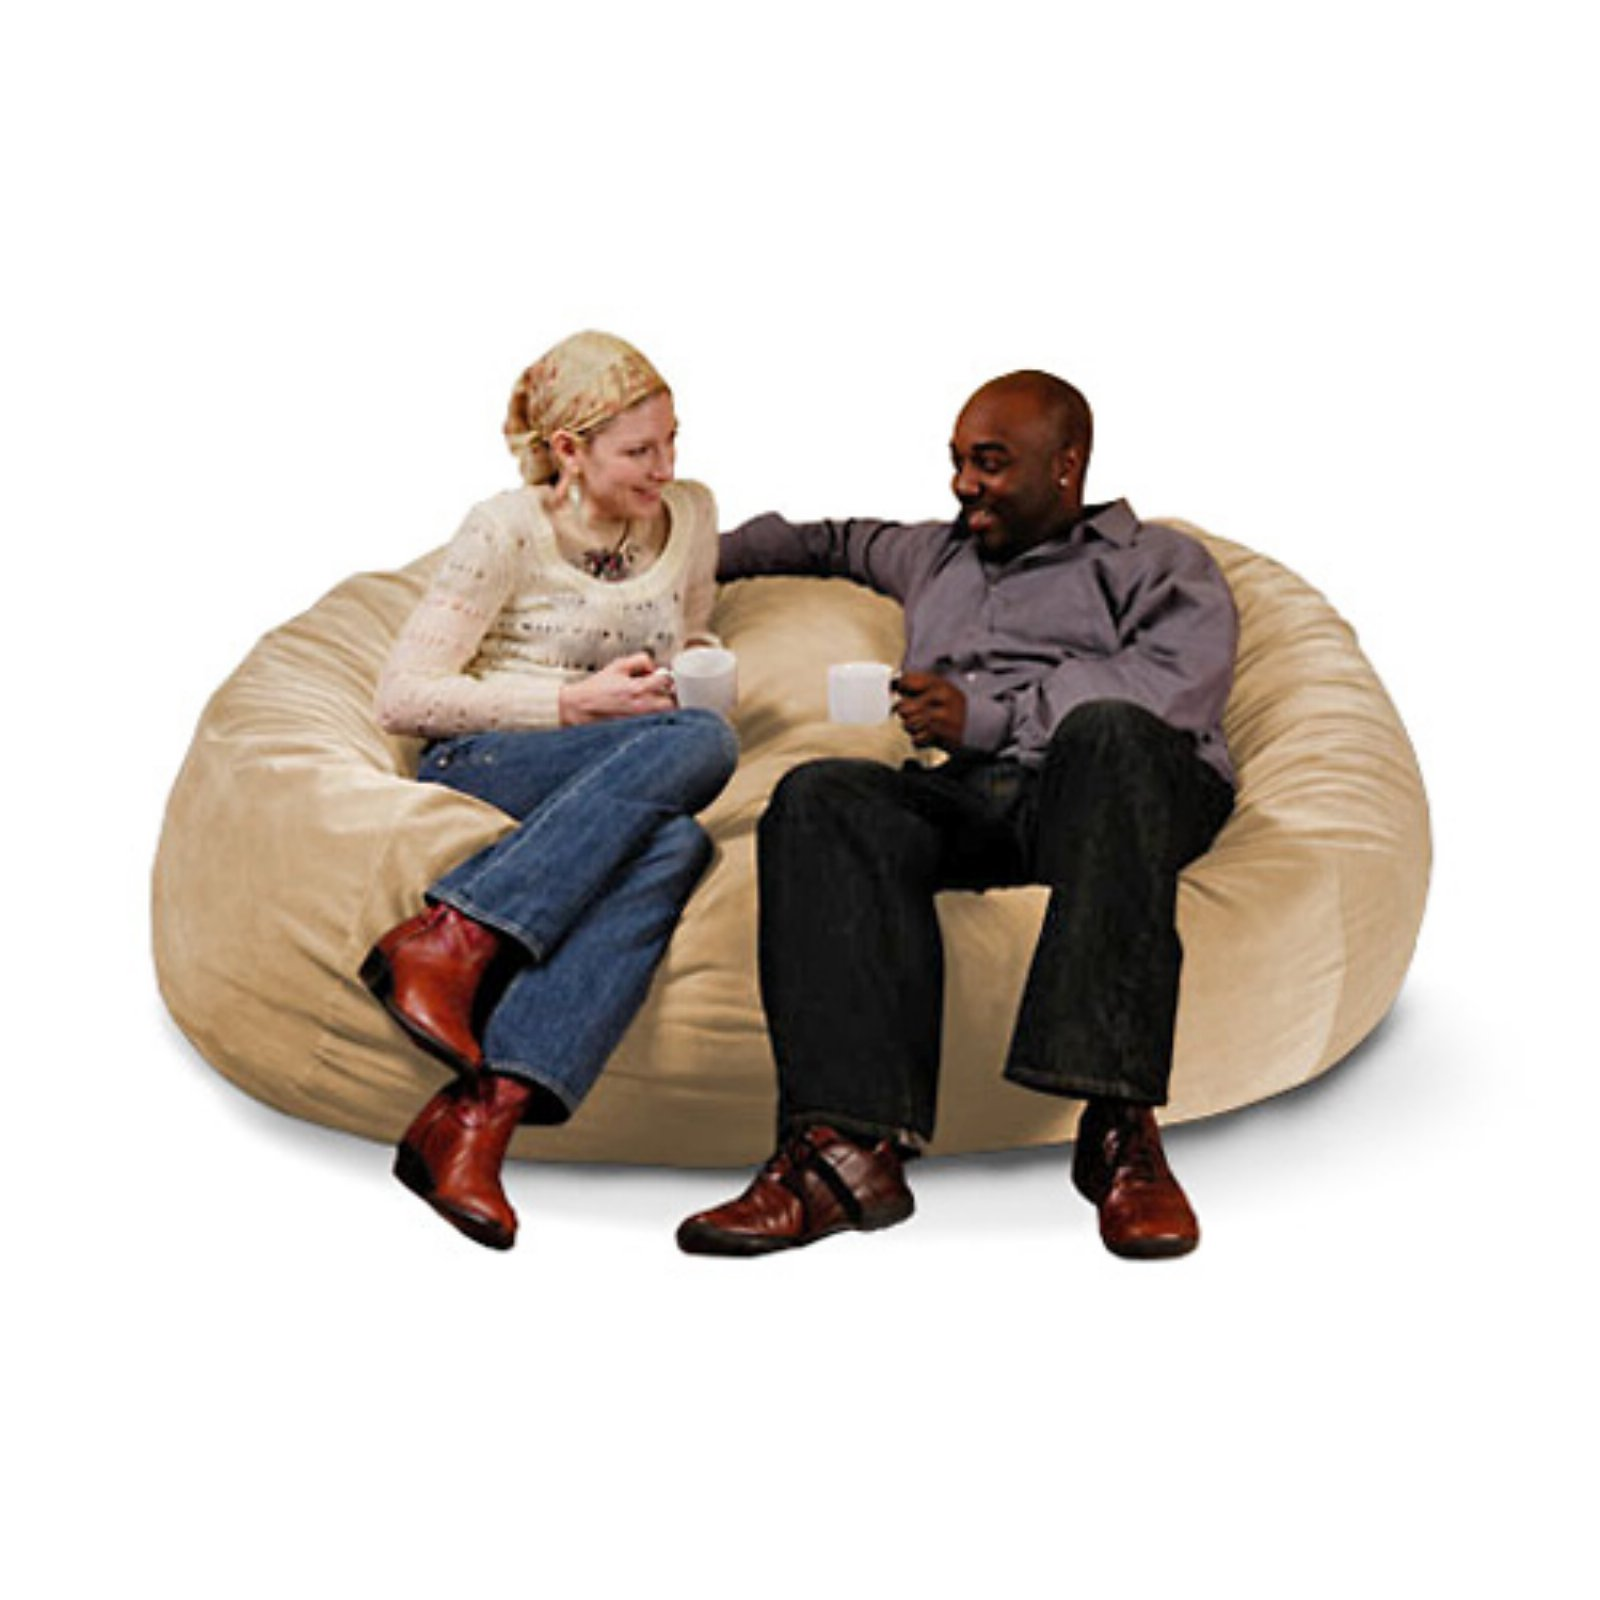 Jaxx 6 ft Lounger Microsuede Medium Foam Sofa